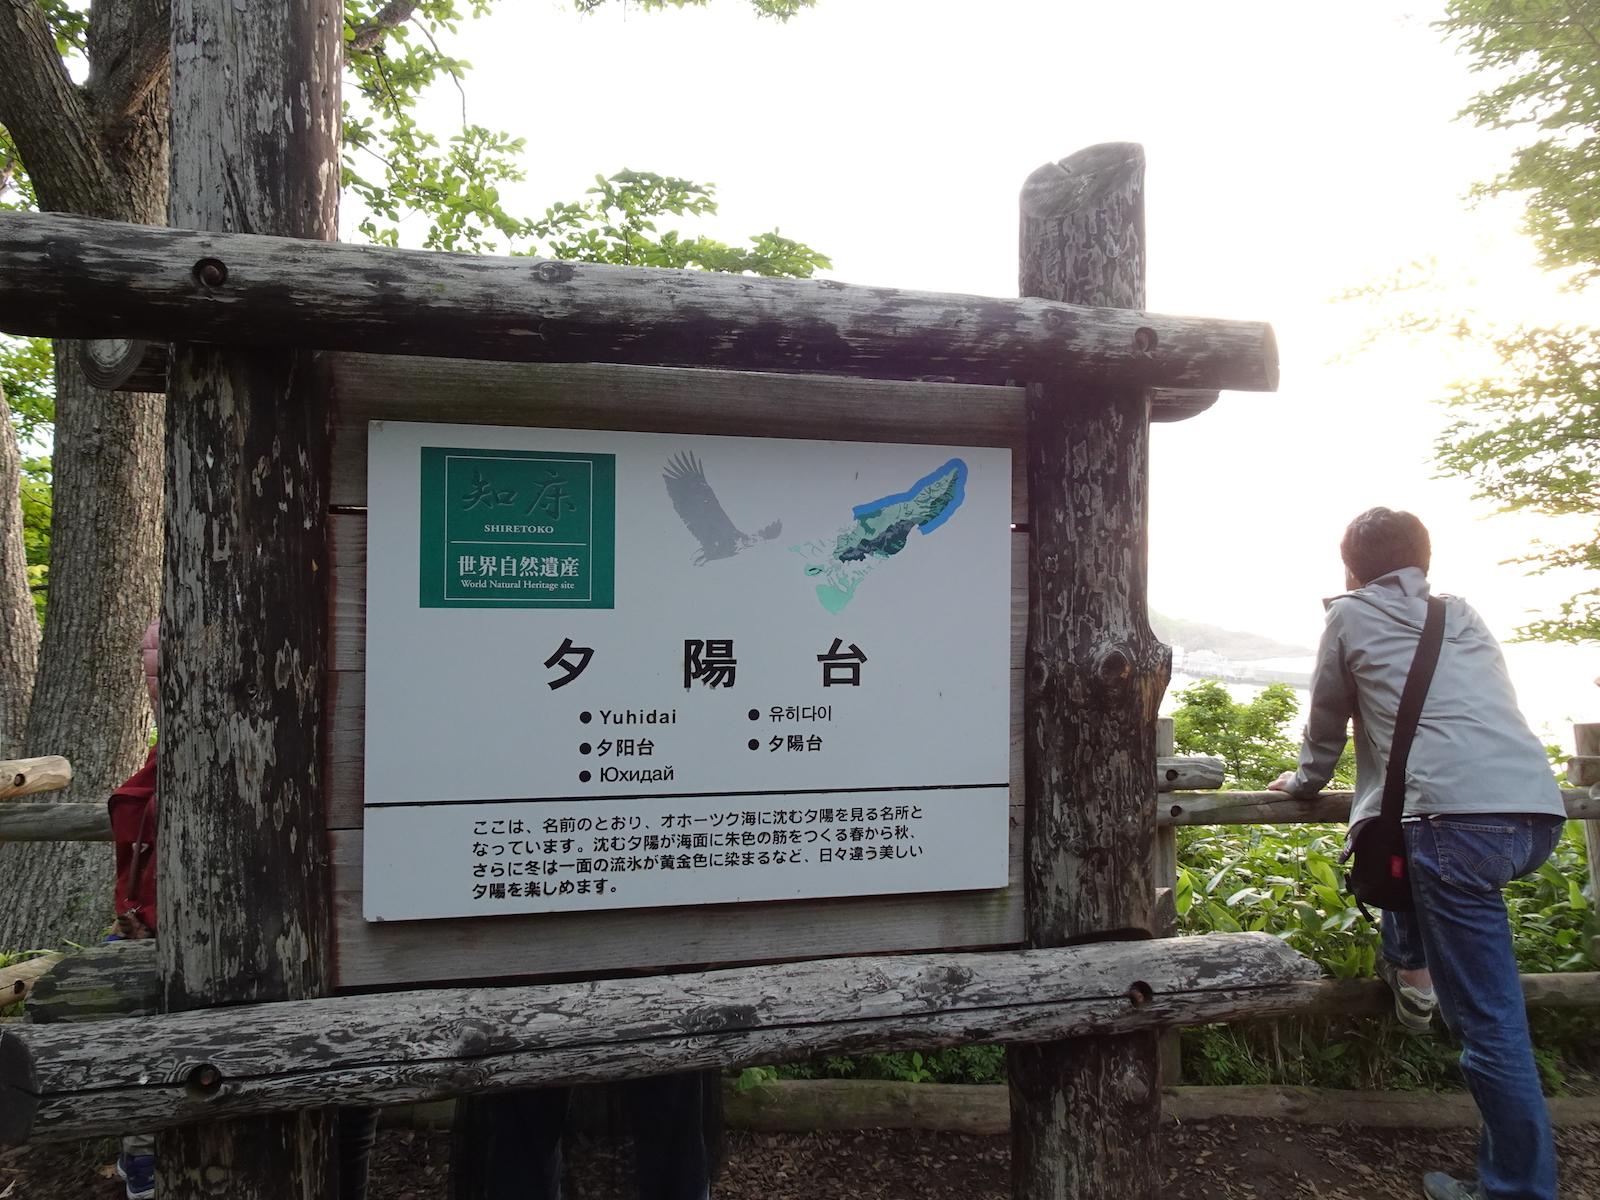 f:id:yasuaki:20190706183408j:plain